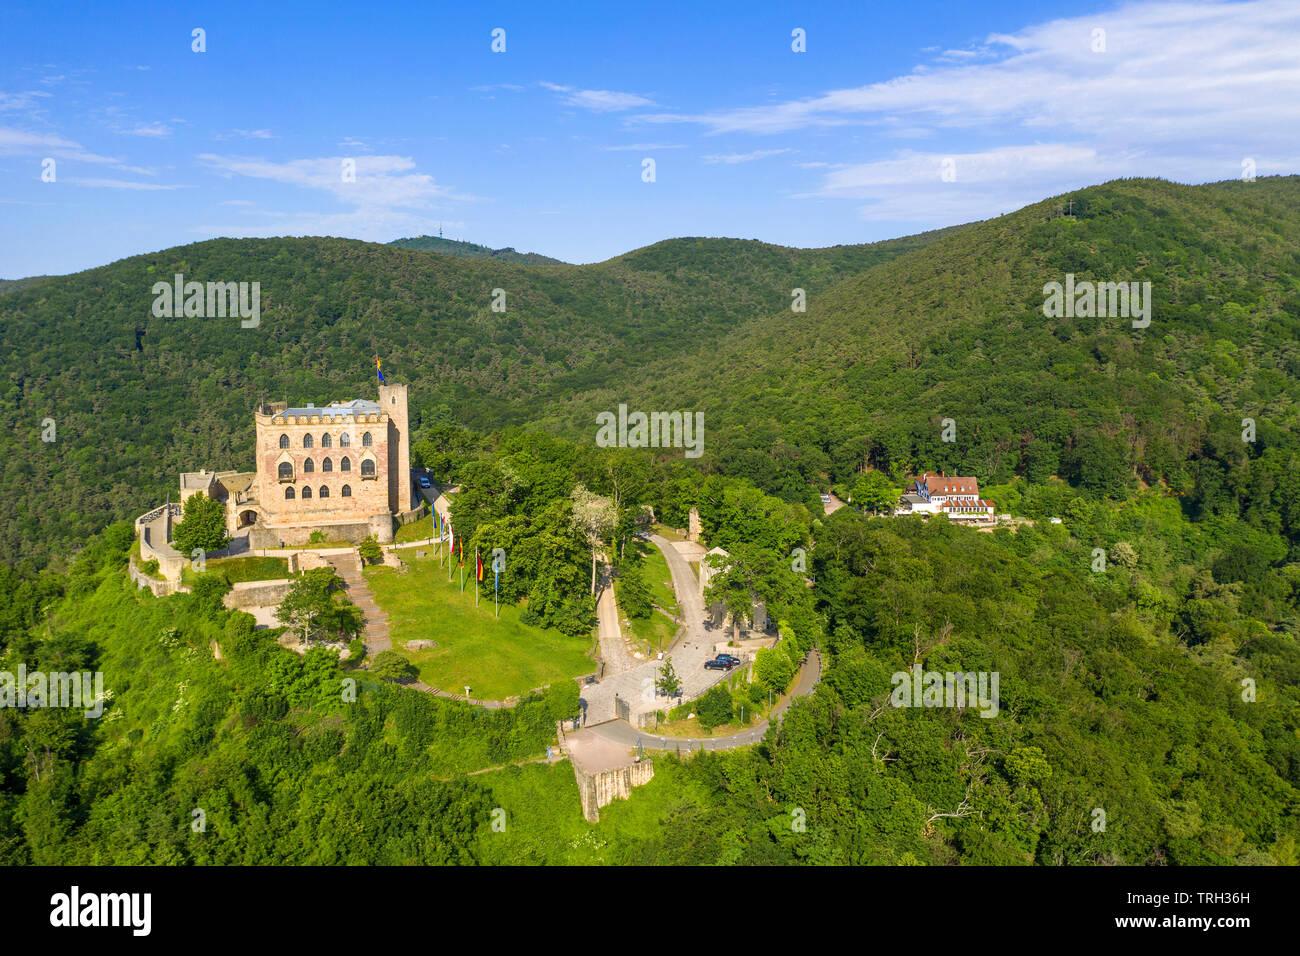 Aerial view of Hambach Castle (German: Hambacher Schloss), symbol of the German democracy, Neustadt an der Weinstraße, Rhineland-Palatinate, Germany - Stock Image